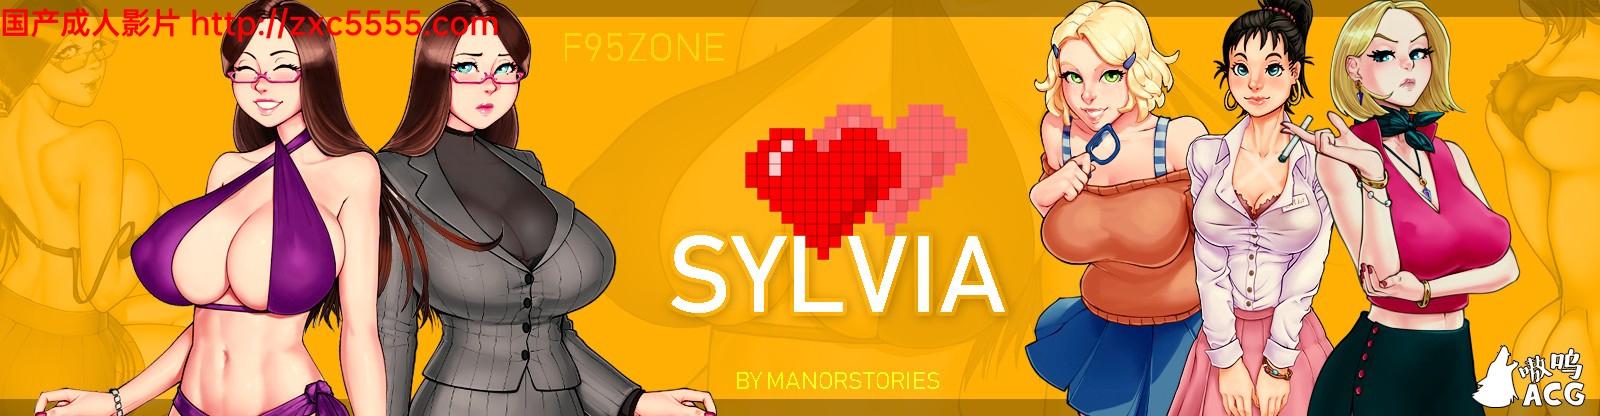 【ADV/汉化/动态】女下属西尔维娅 V1906汉化版[PC+安卓]【1.6G】070902